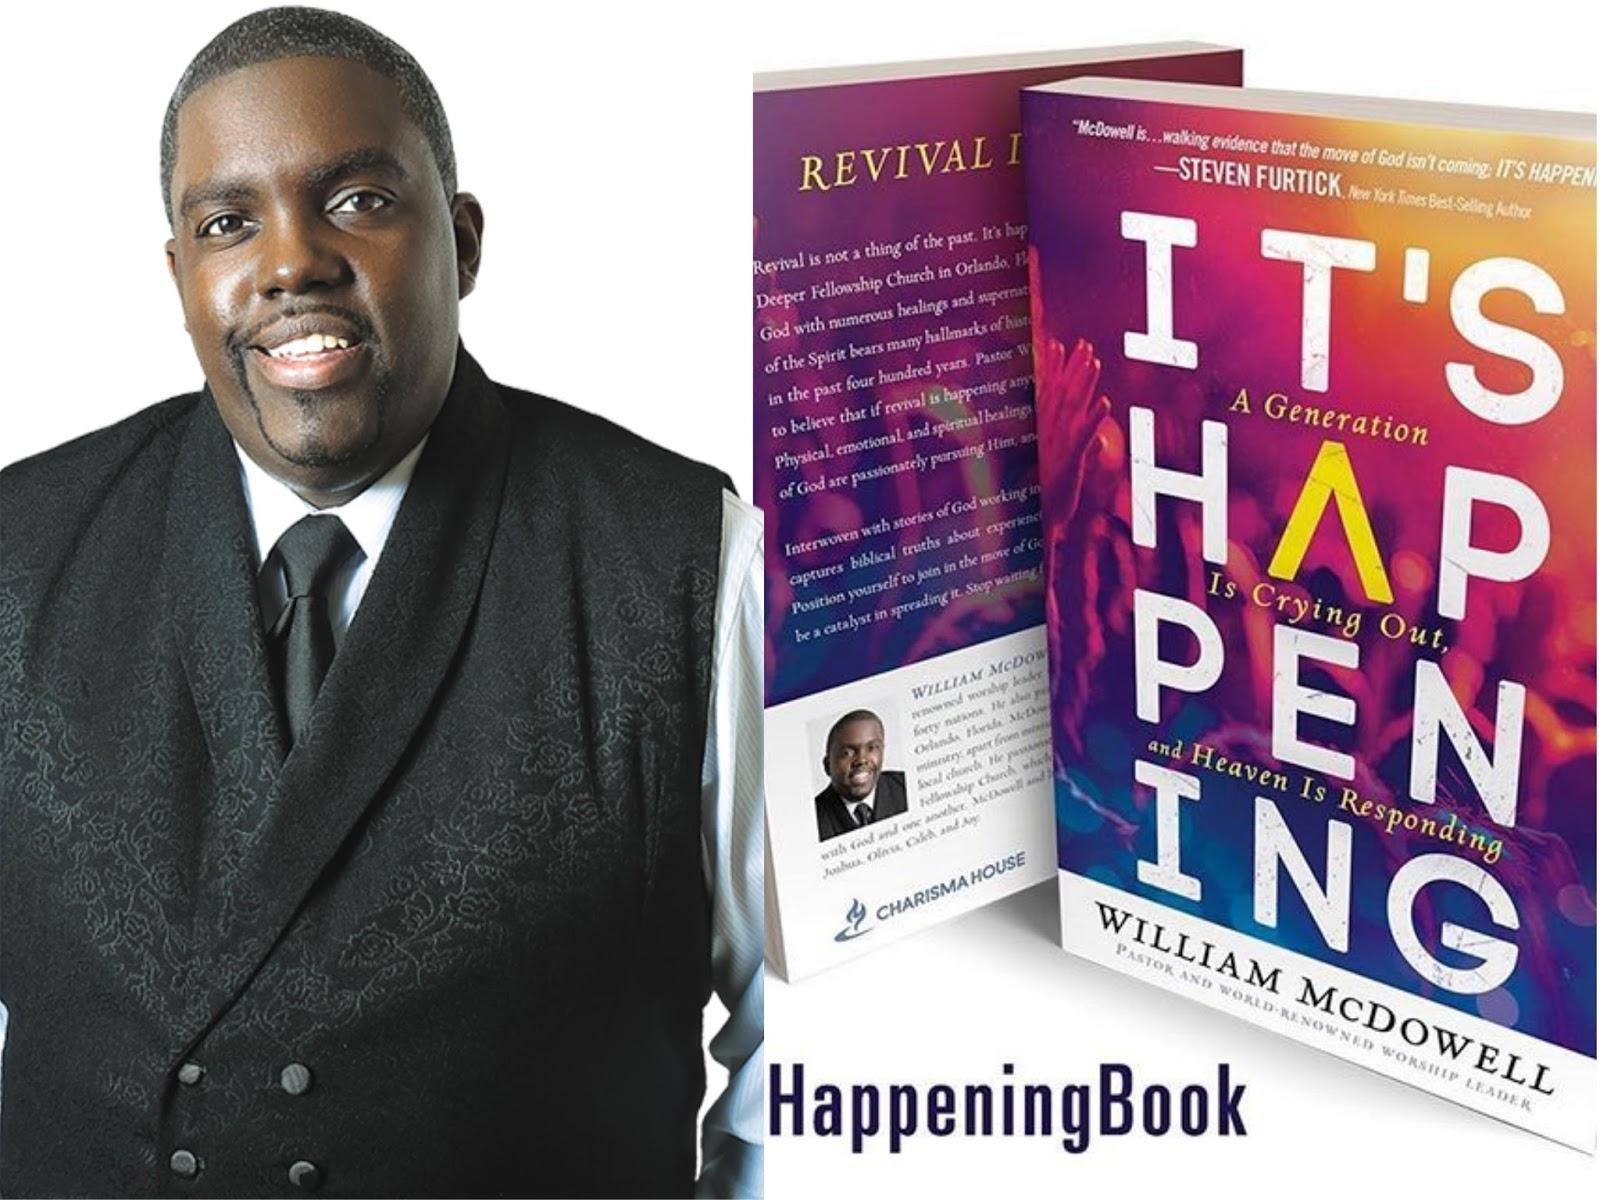 William McDowell Book. Its Happening. Gospel Redefined